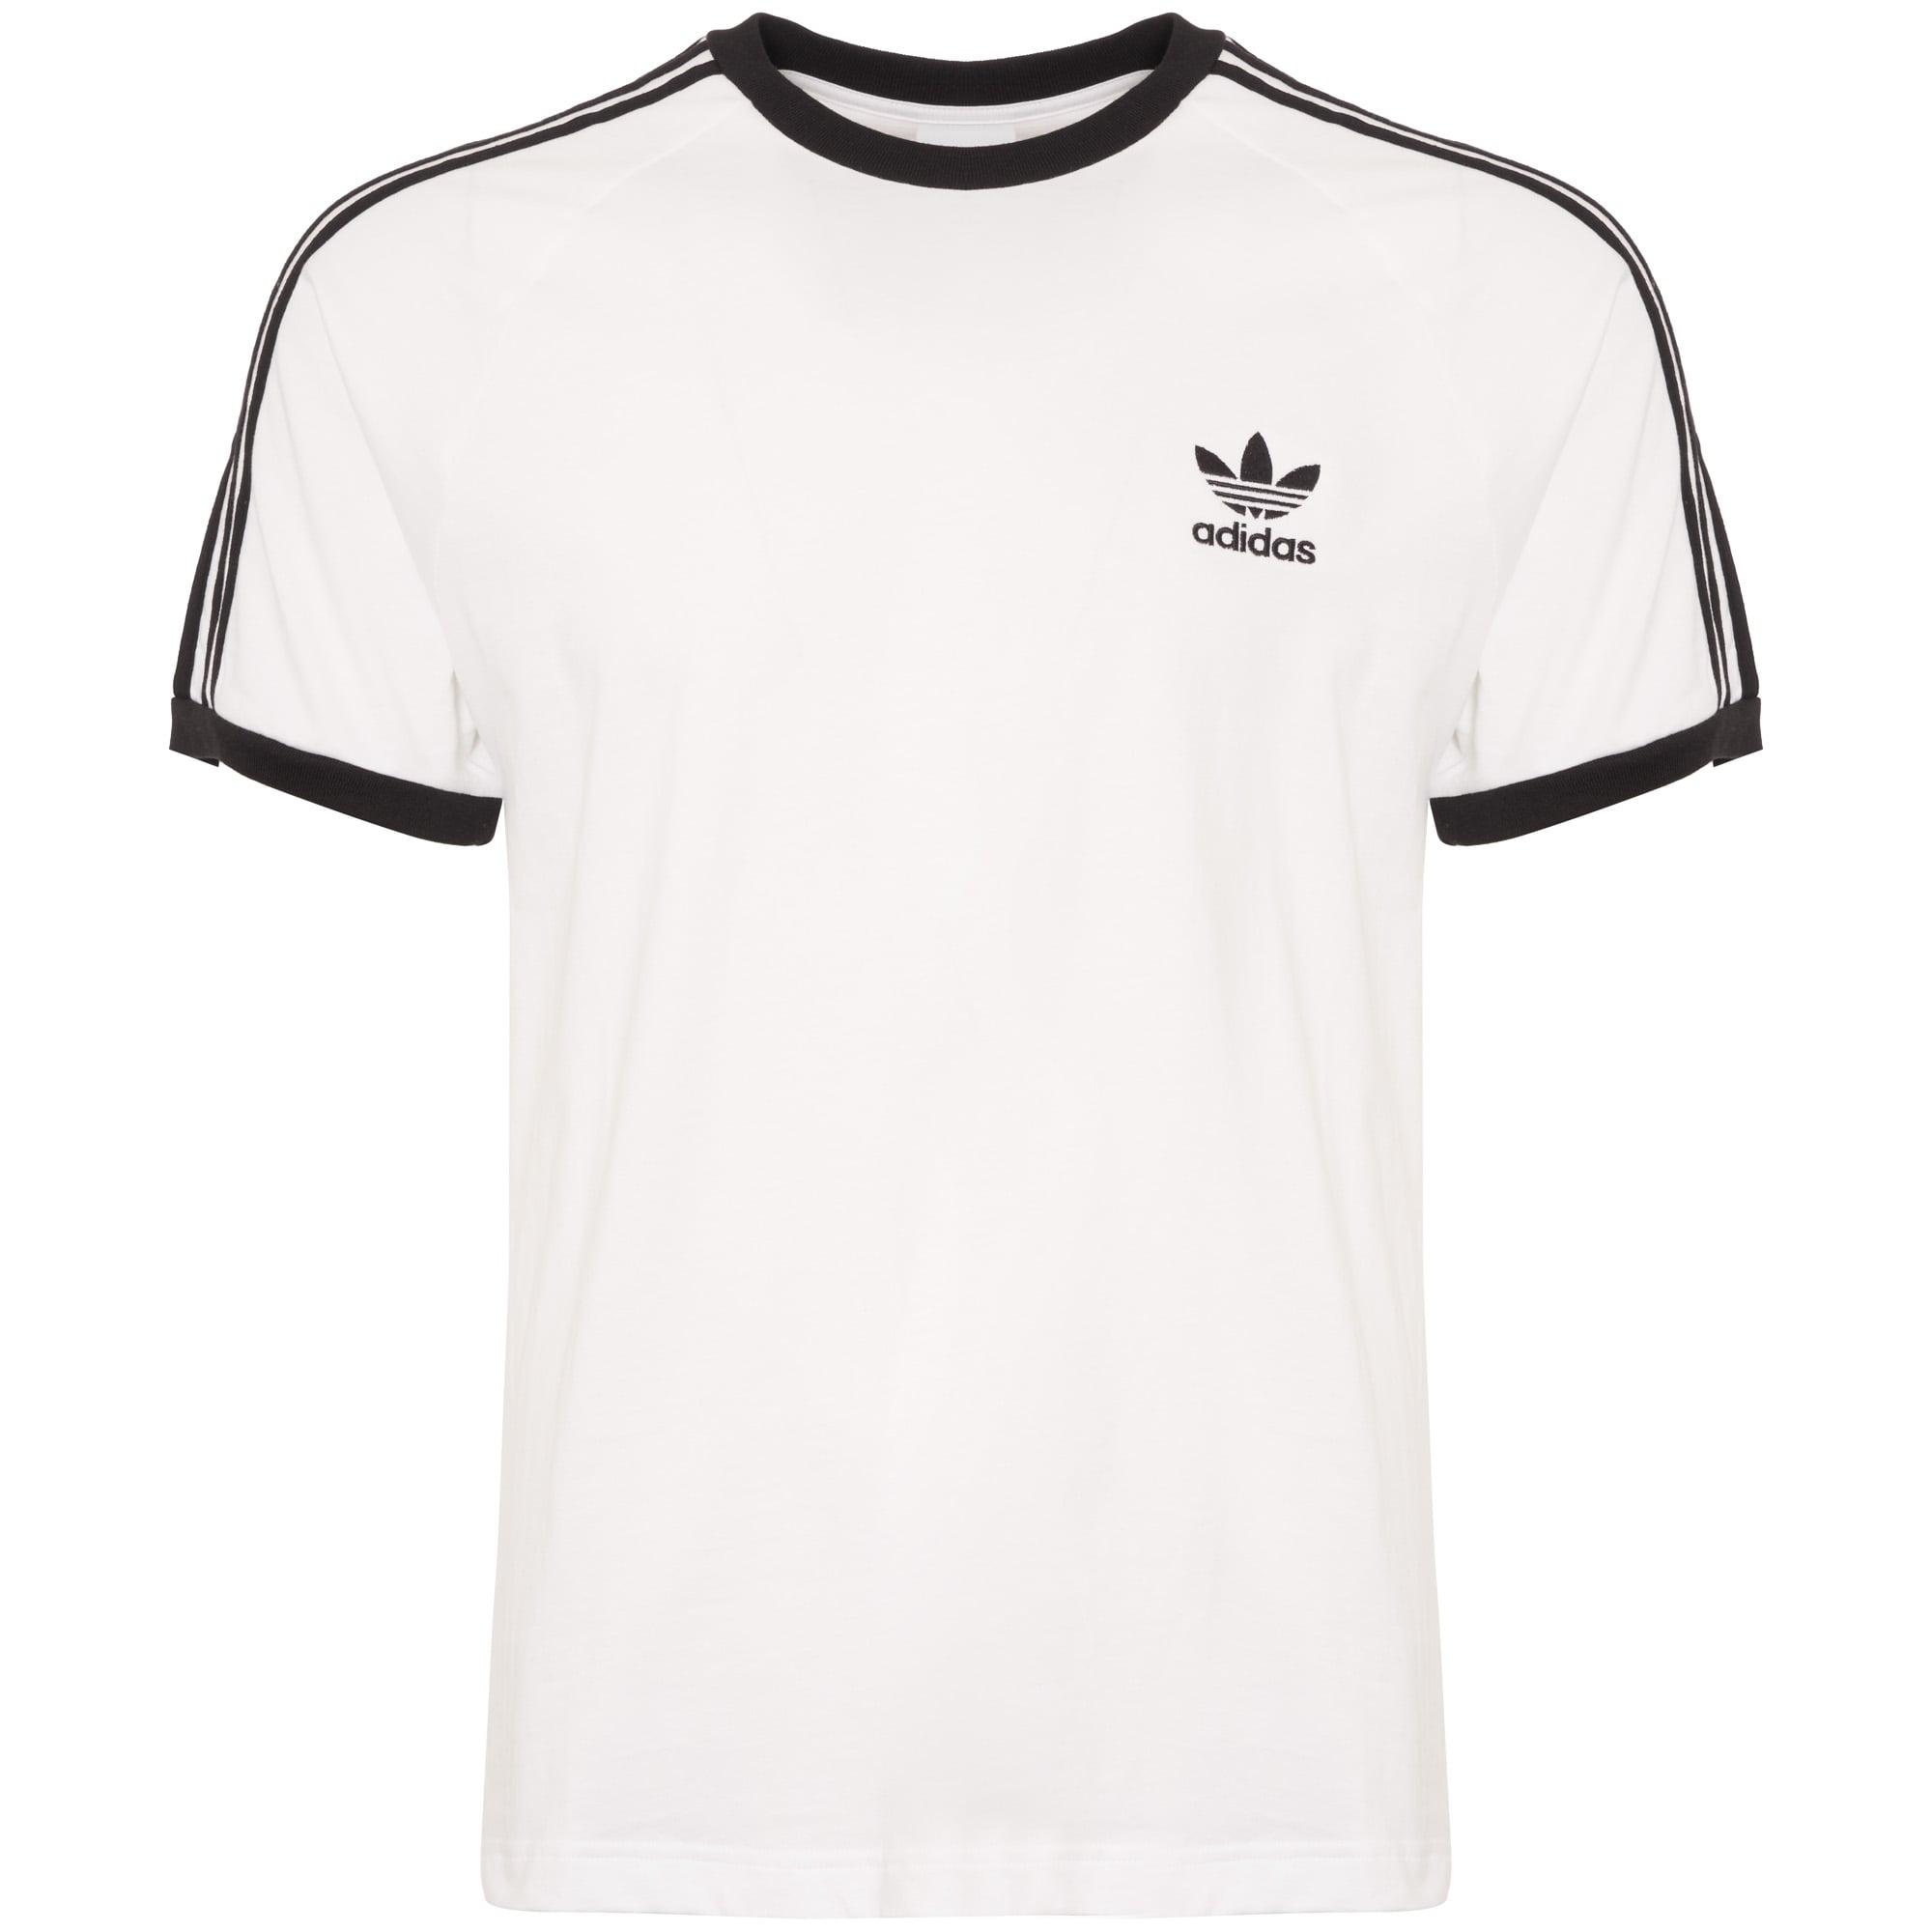 1cd45eeba9 Adidas 3-Stripes T-Shirt | White | CW1203 | Stuarts London